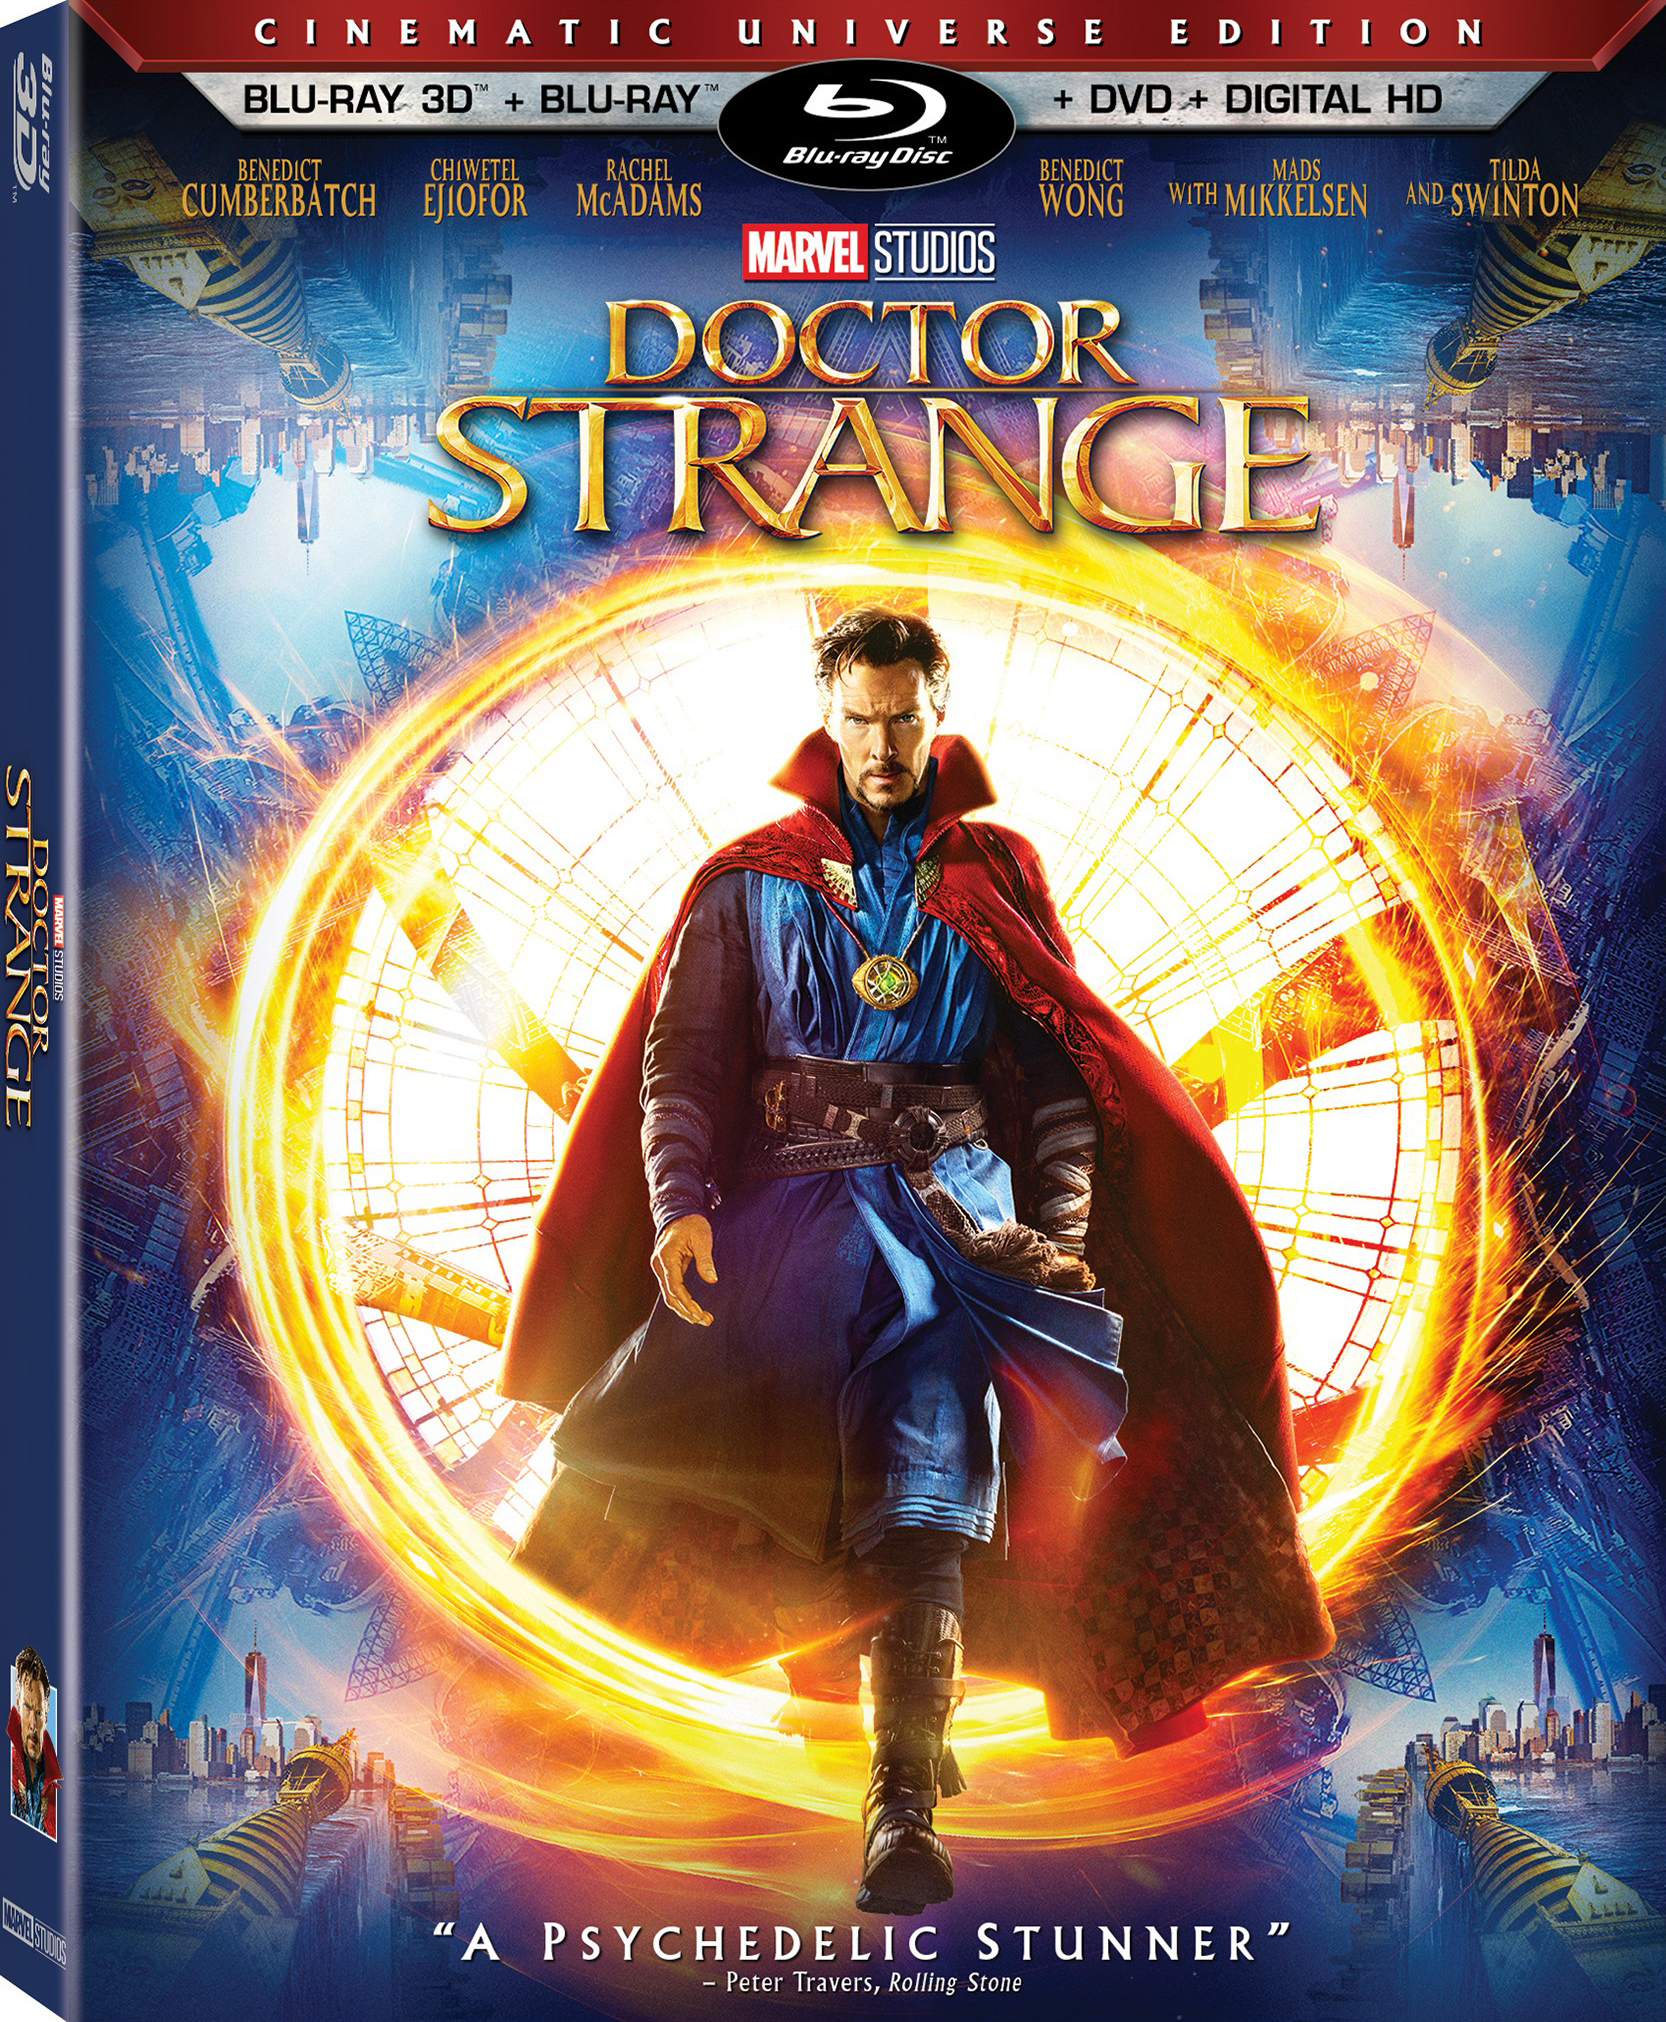 Doctor Strange (2016) poster image